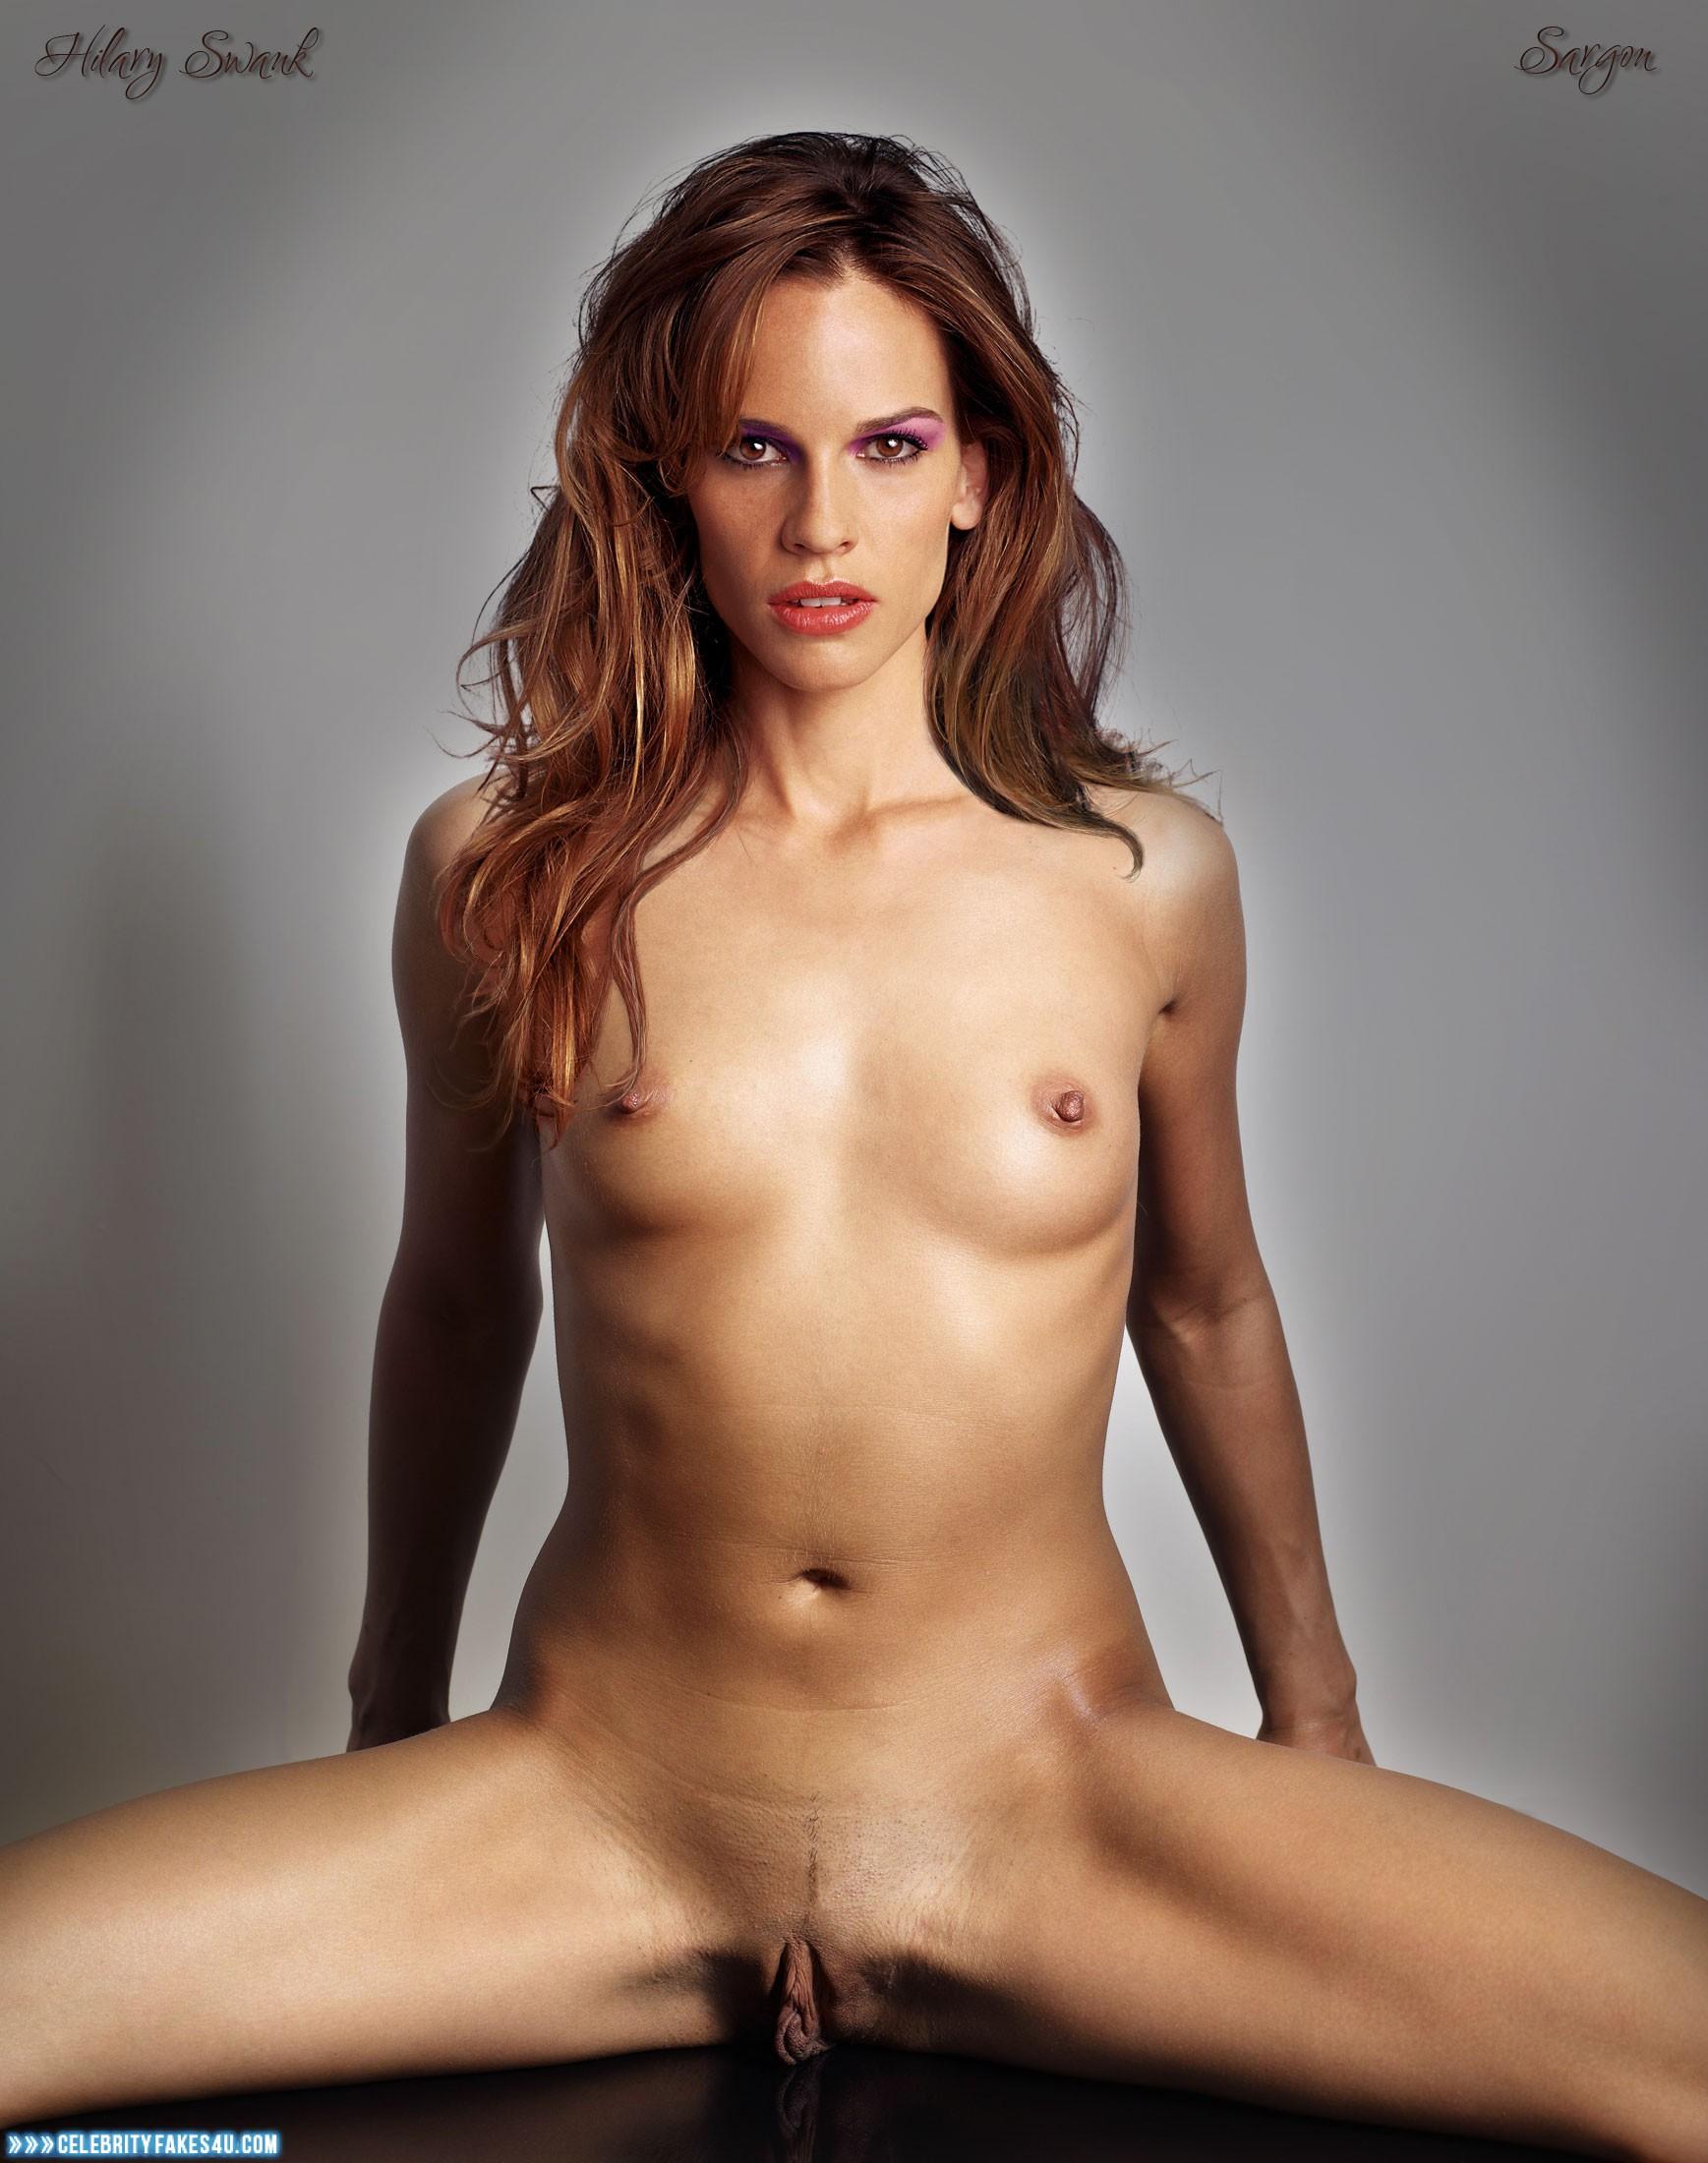 hilary-swank-nude-videos-sexy-naked-pornstars